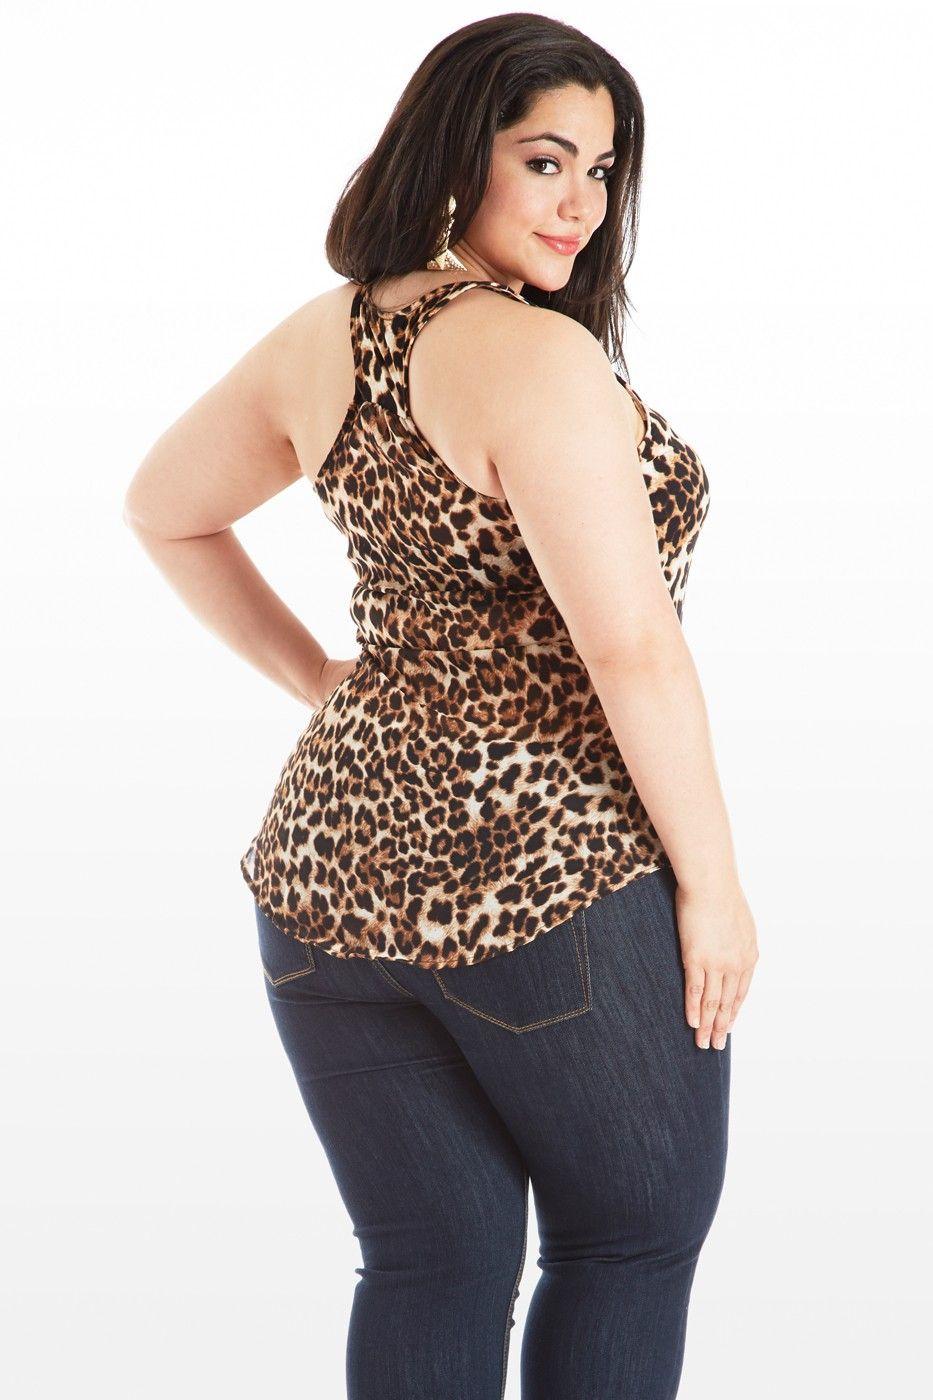 Tank Me Back Animal Print Tank Top Plus Model Nicole Zepeda Dorothy Combs Models